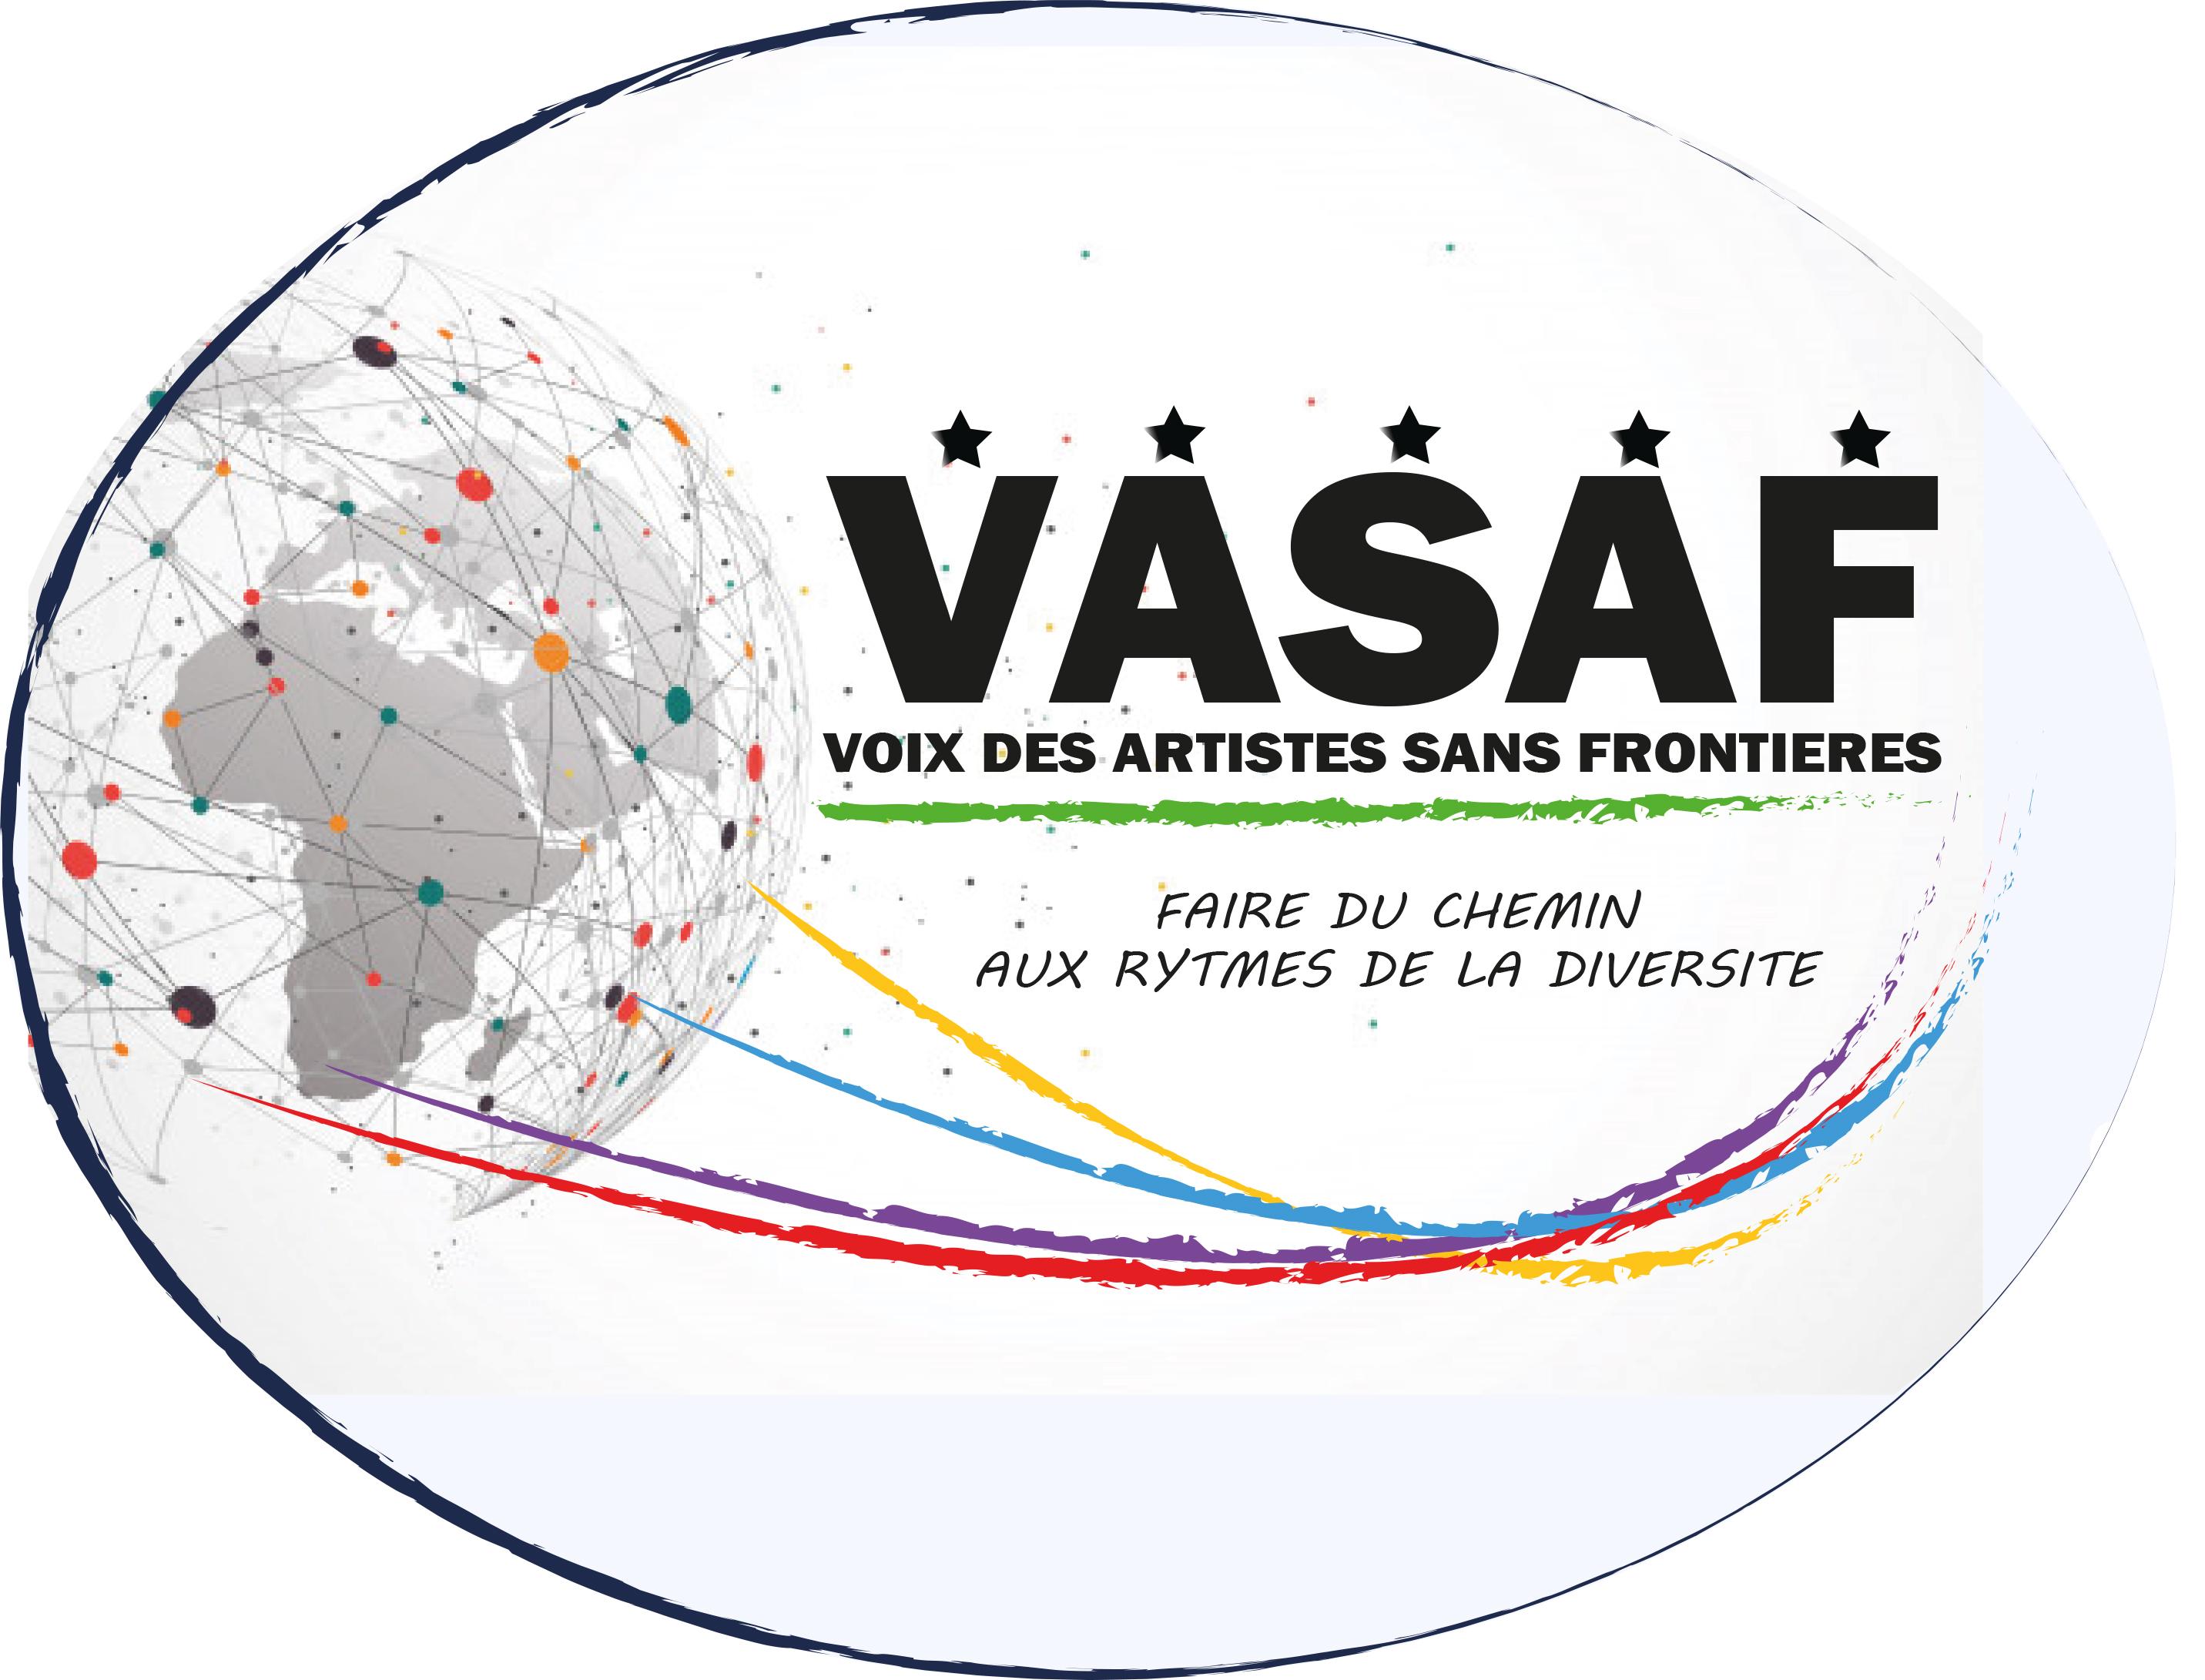 VASAF, artiste, musique, lyon, concert